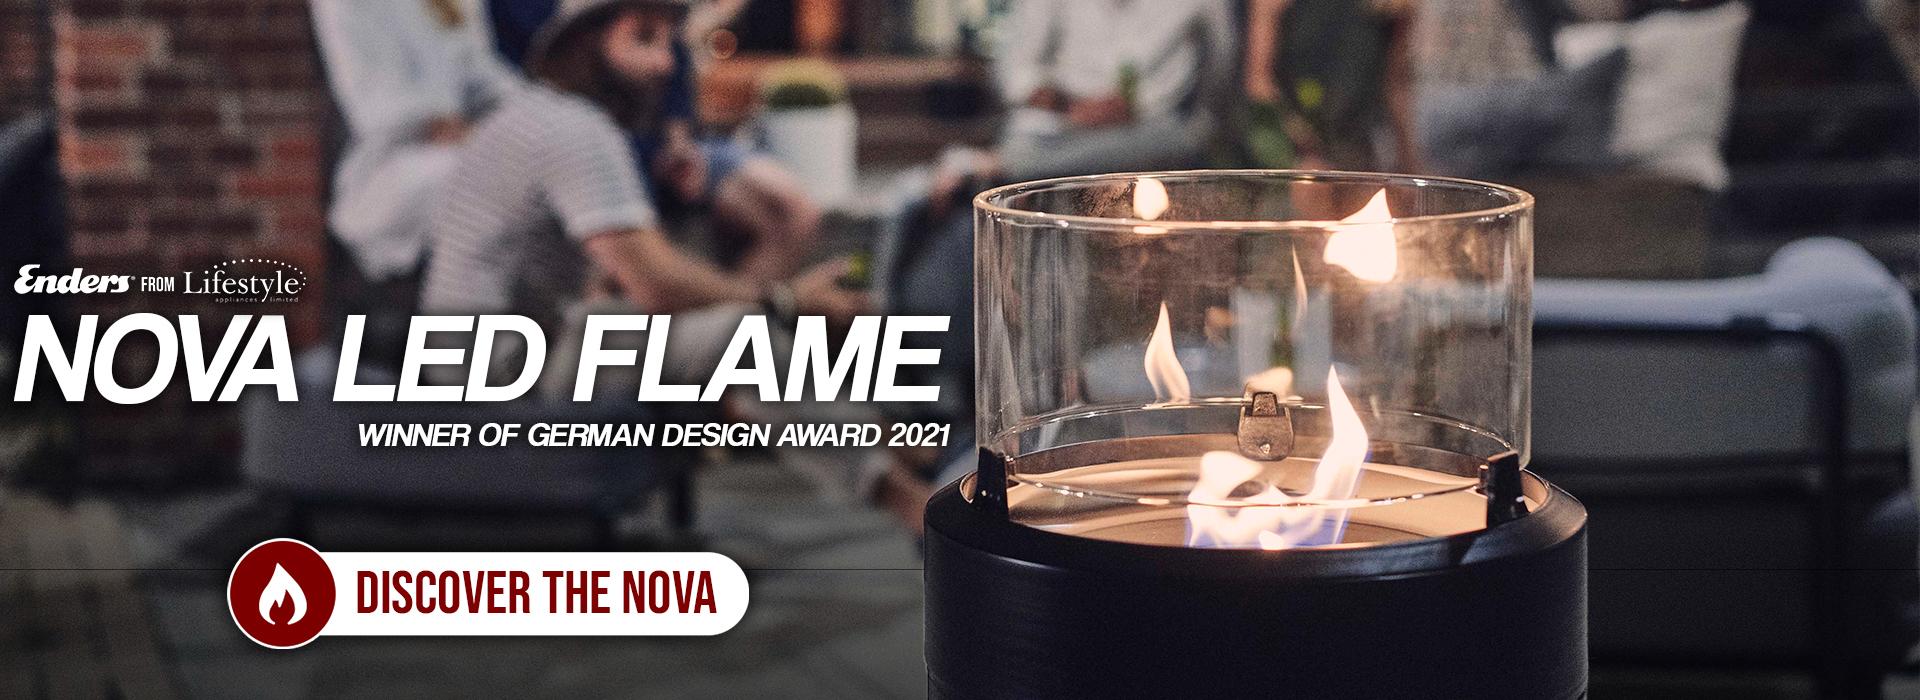 Enders NOVA LED flame fire pit